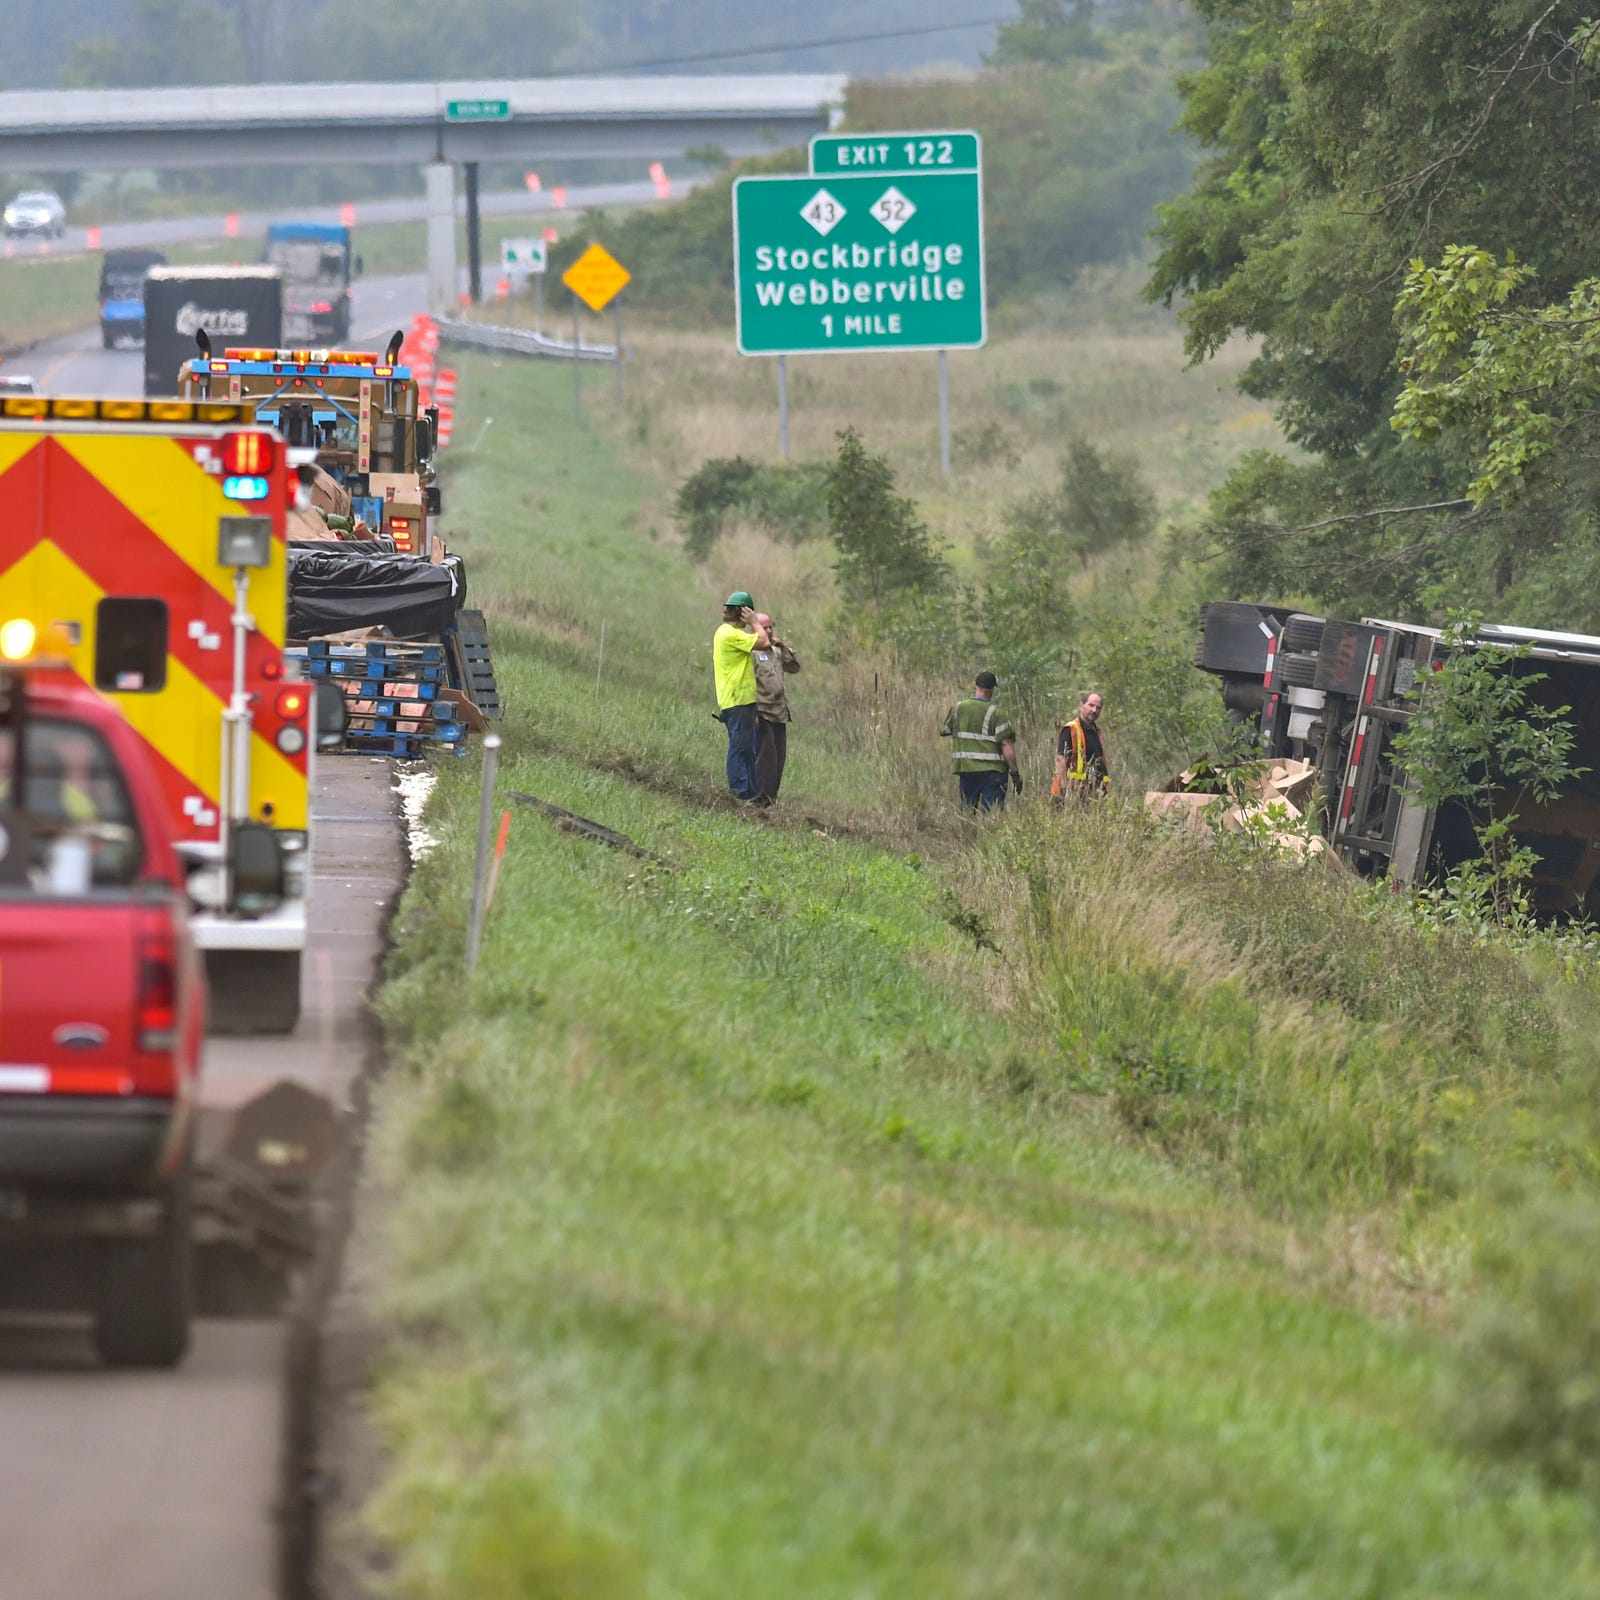 2 semis, 1 hauling watermelons, crash on Interstate 96 in Leroy Township; 1 injured